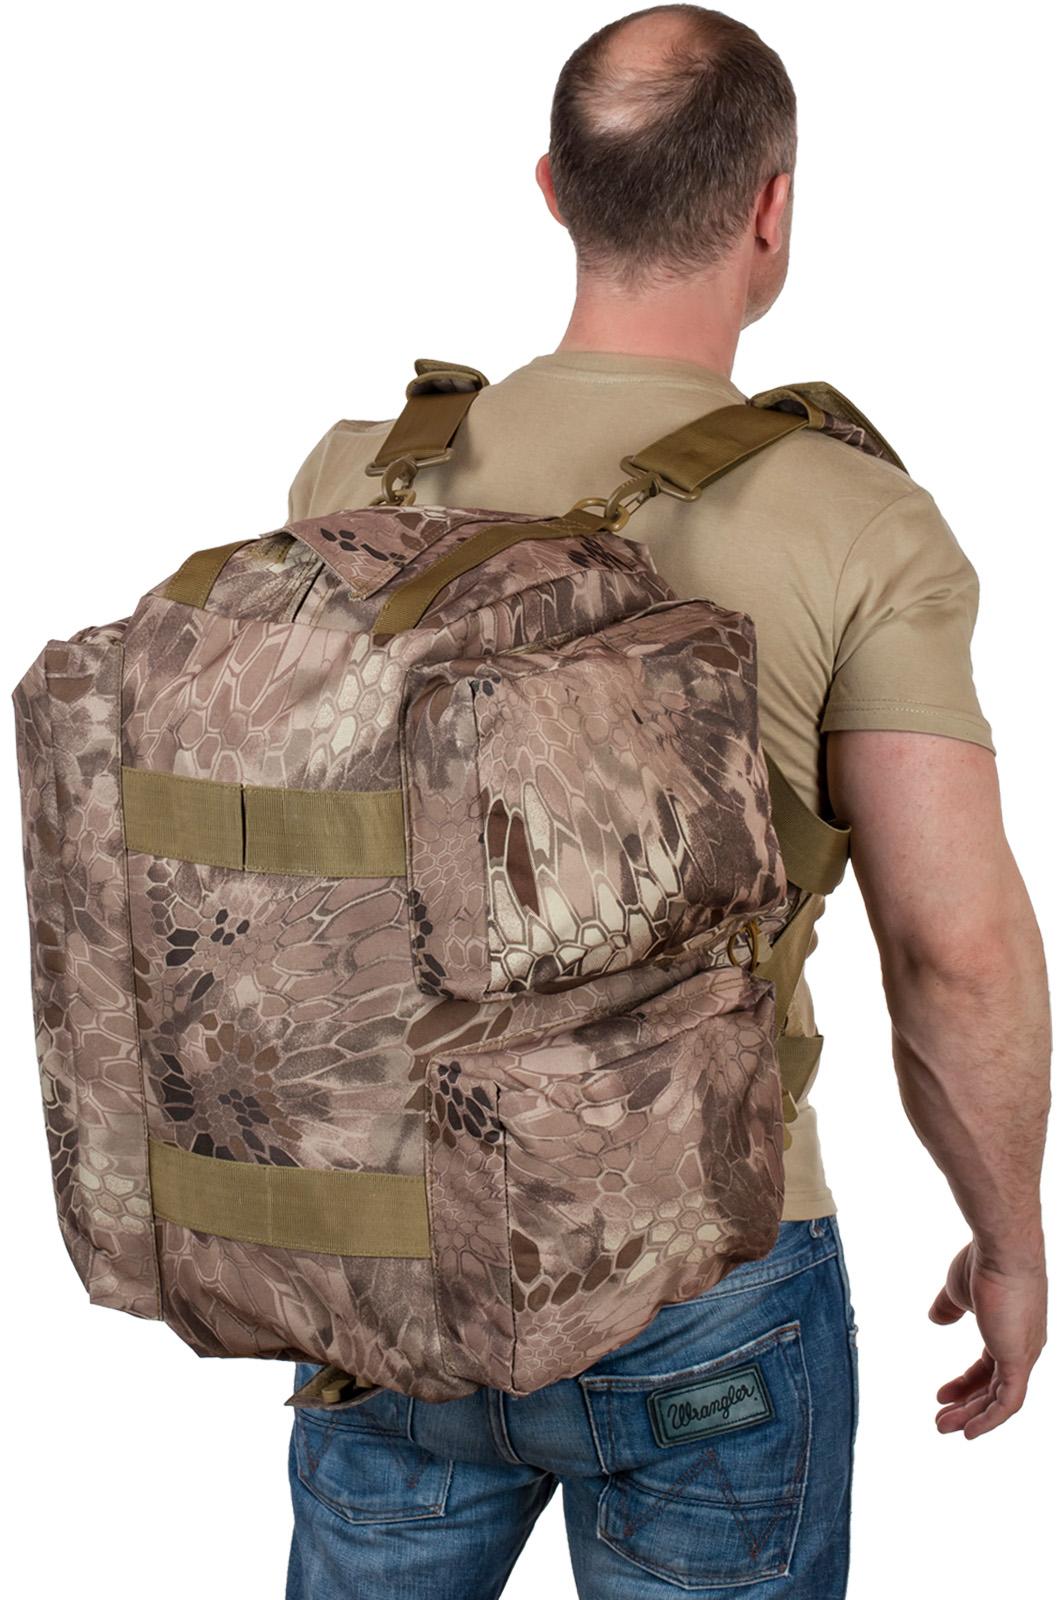 Снаряжение морских пехотинцев: тактические сумки и рюкзаки